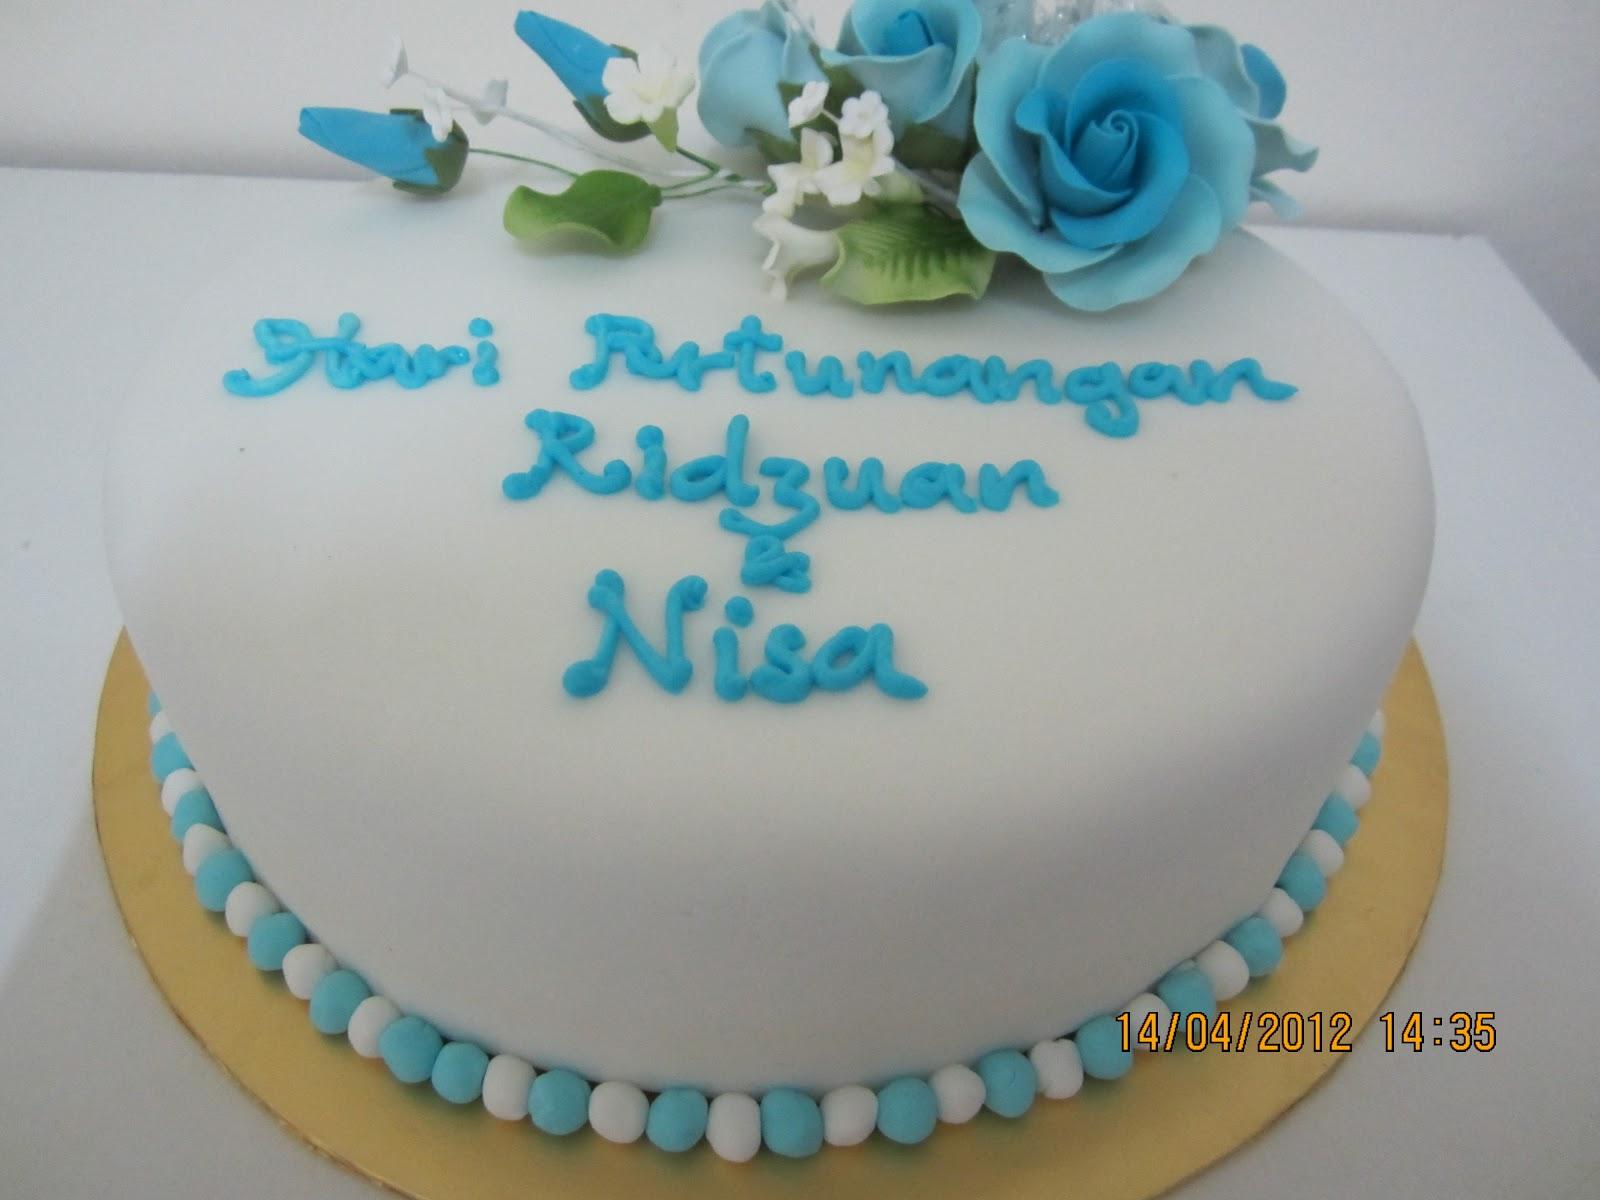 Superb HANTARAN CAKE GALLERY